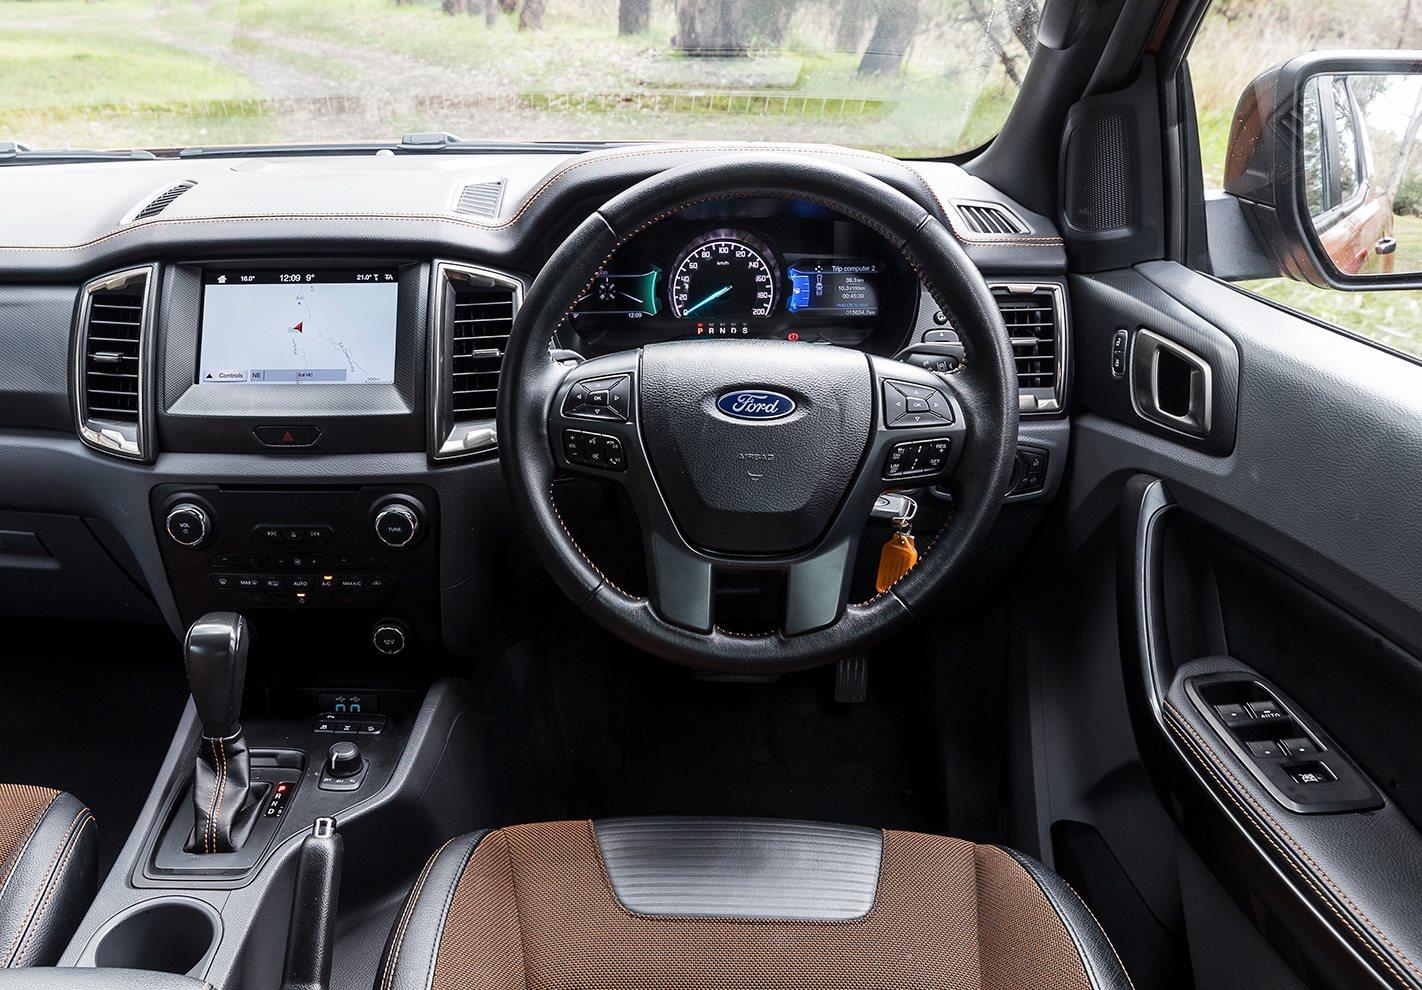 Ford Ranger Wildtrak steering wheel.jpg